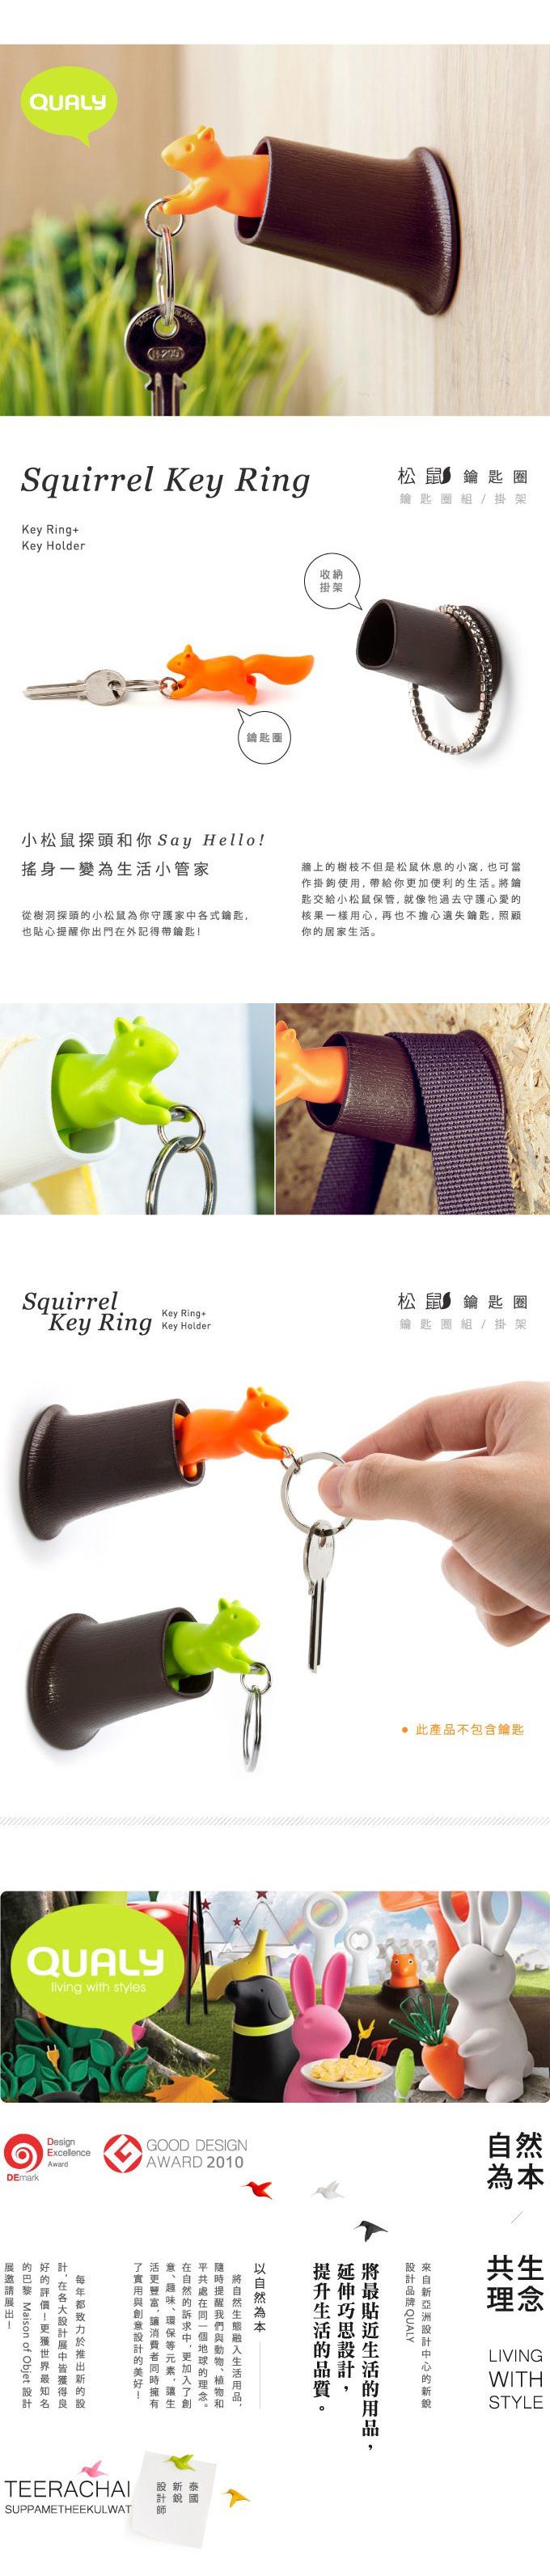 QUALY 松鼠鑰匙圈 綠色